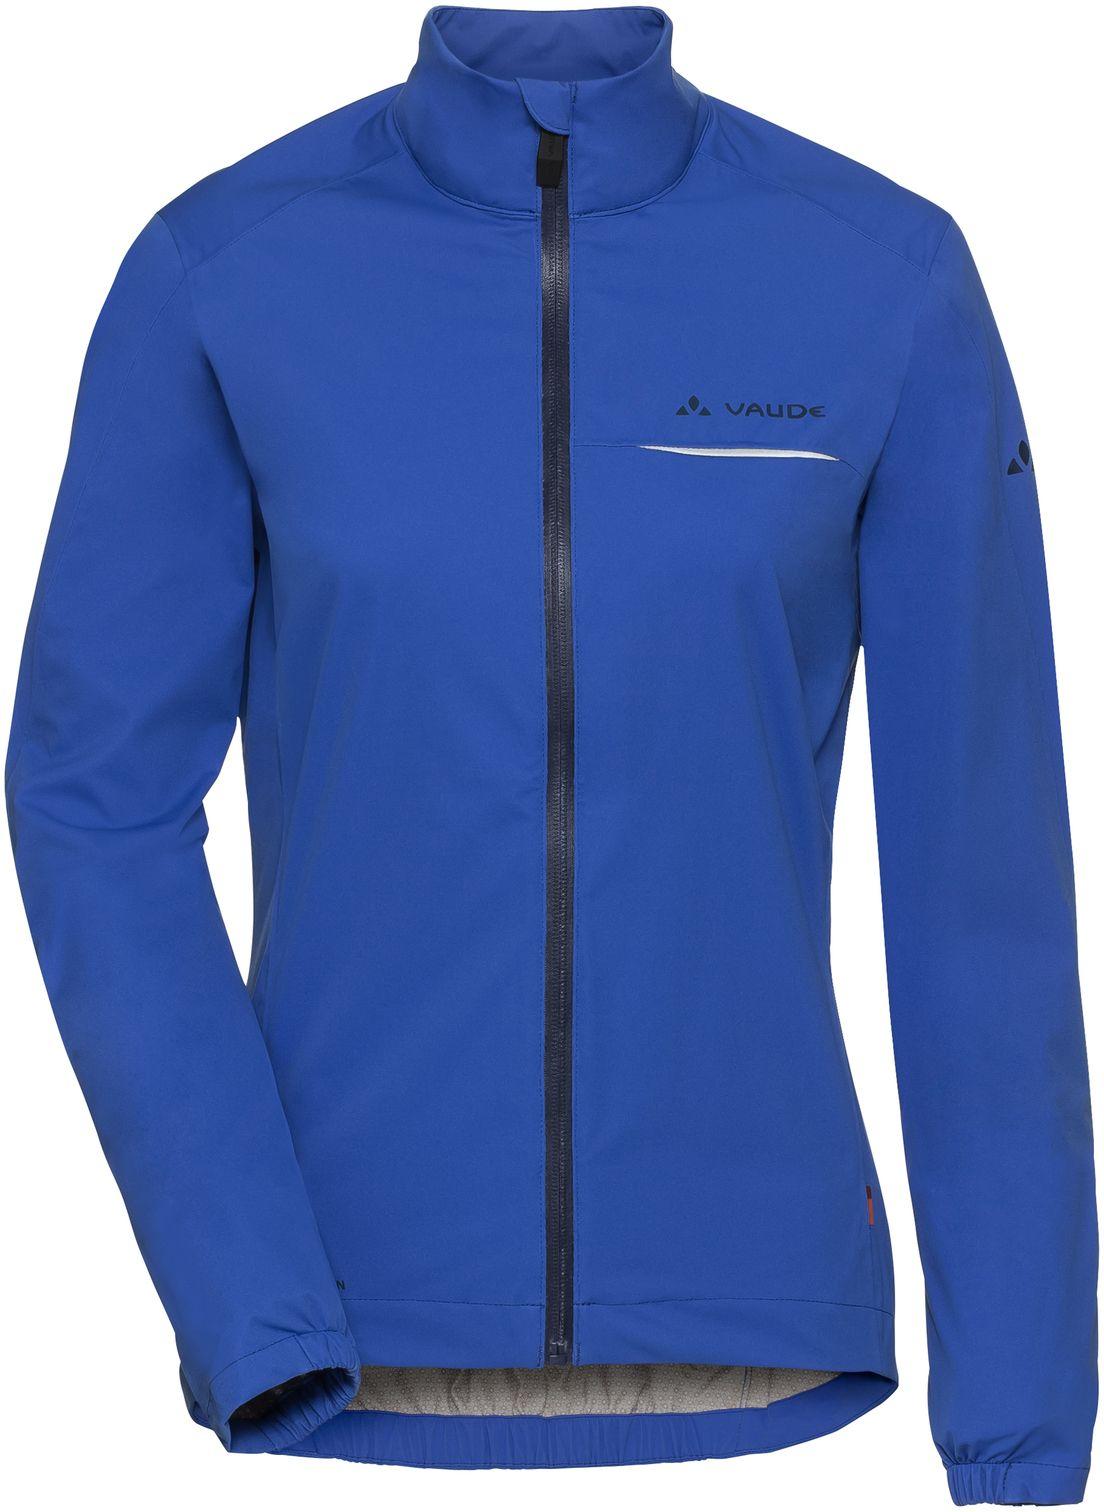 Vaude Women's Strone Jacket - gentian blue 40